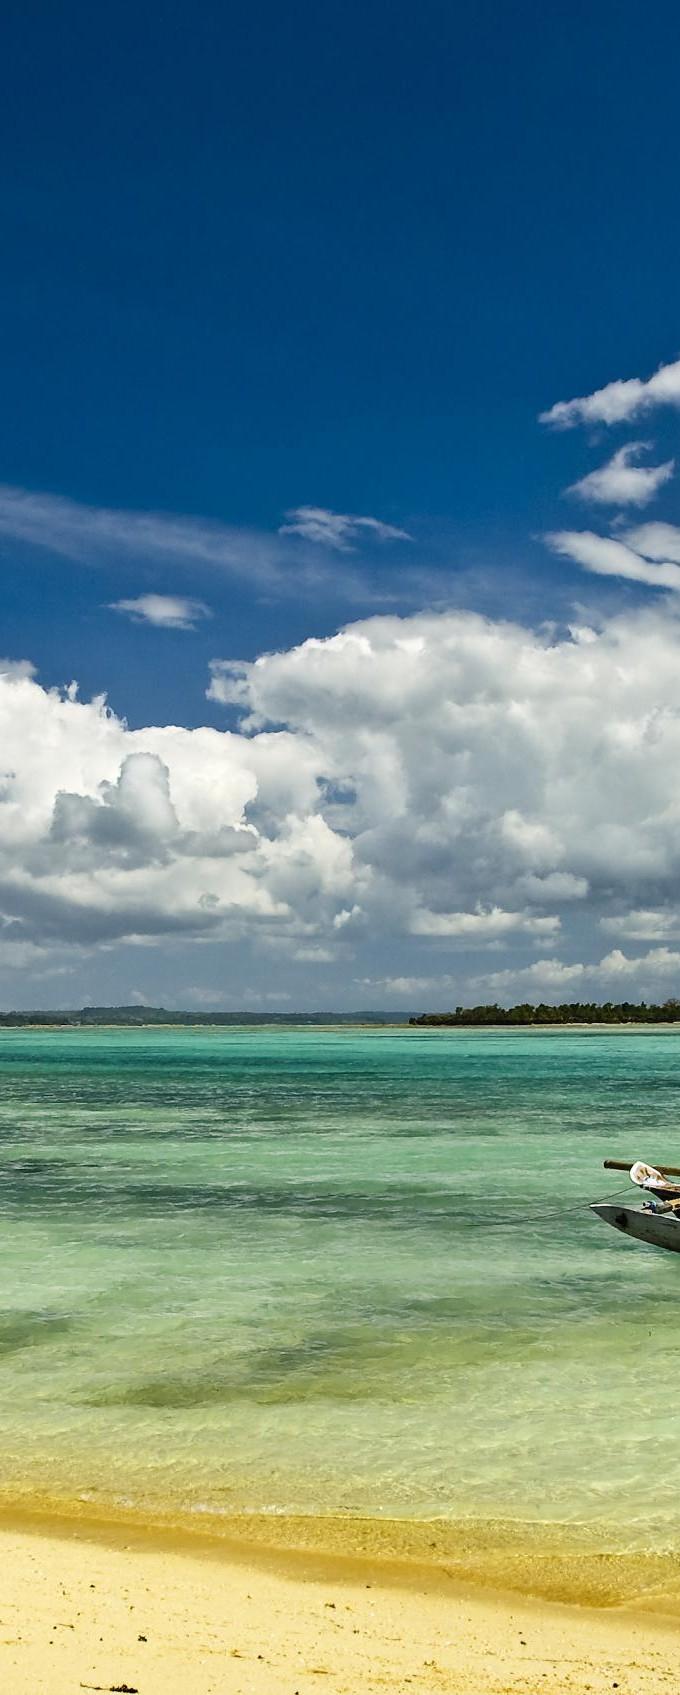 Three fishing boats at northern Zanzibar coast